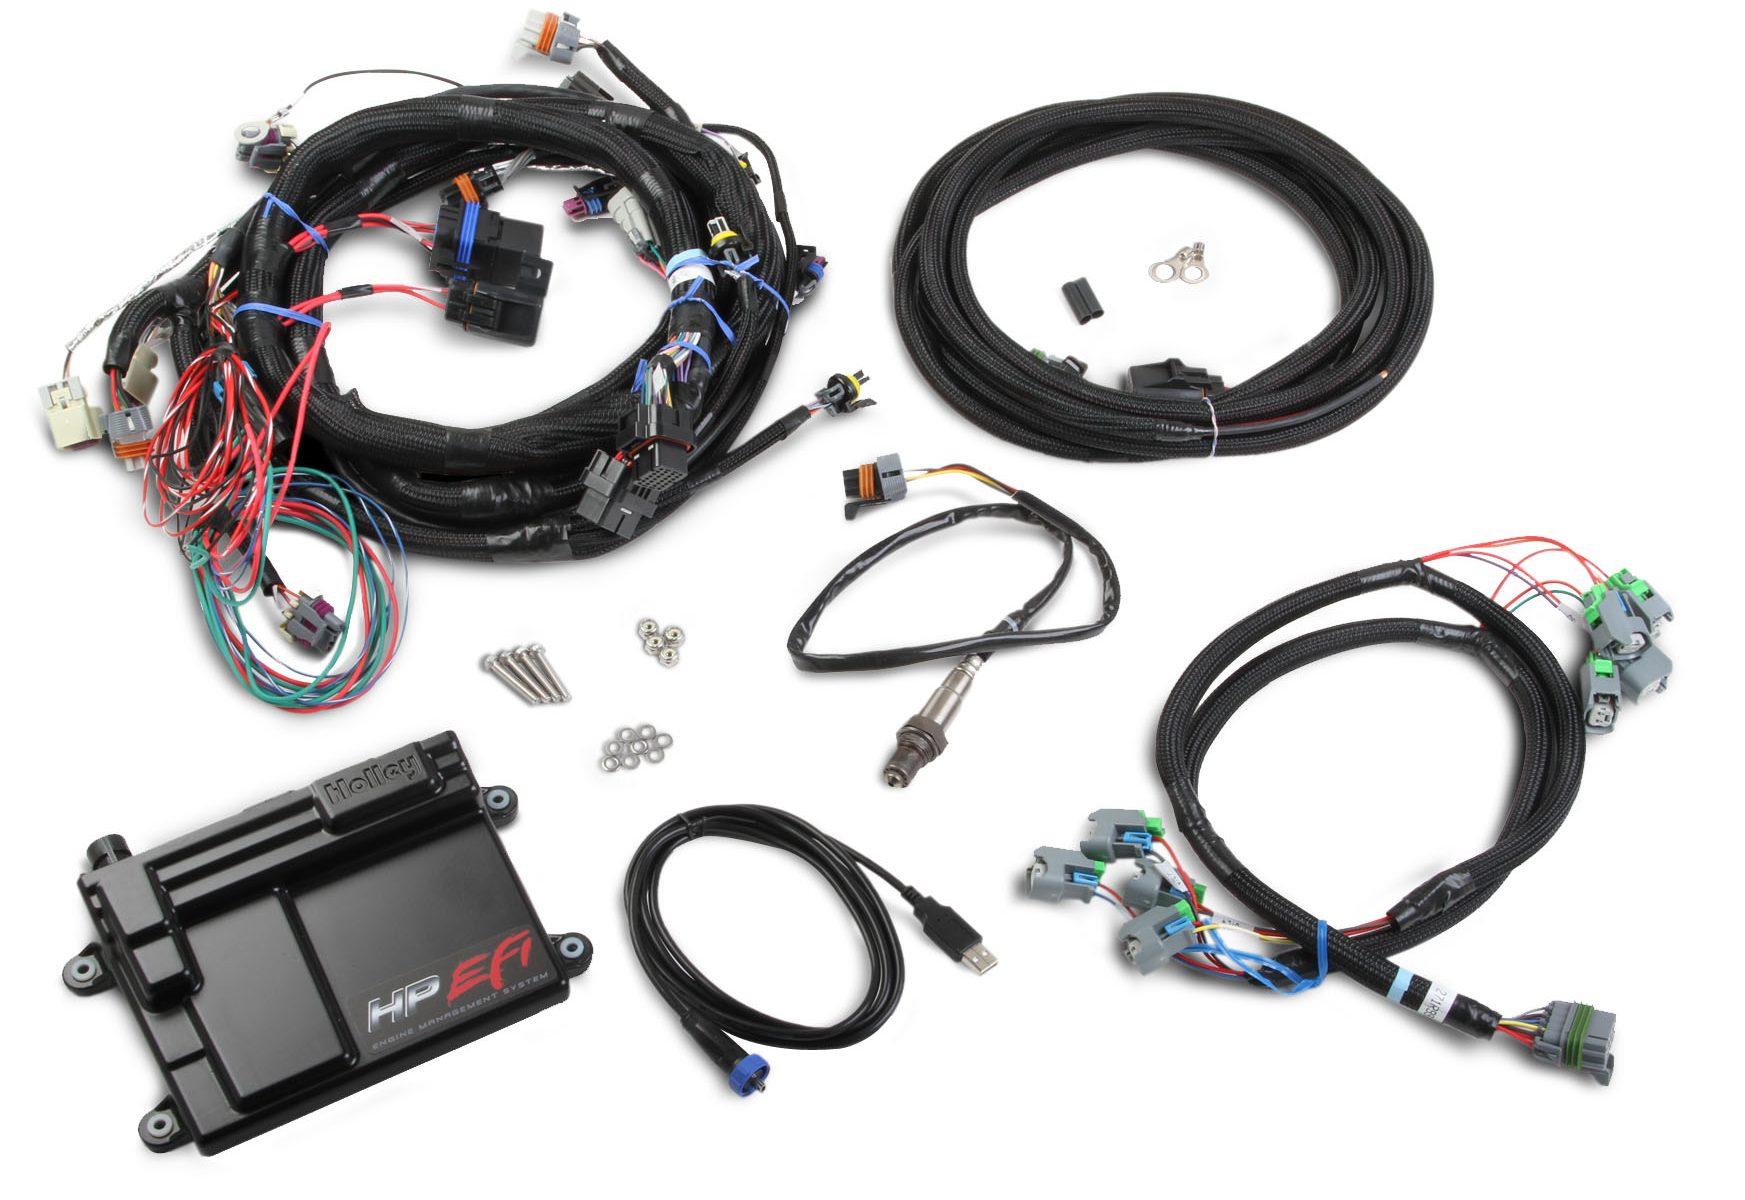 hight resolution of home shop wiring harness holley gm ls2 ls3 ls7 hp efi ecu harness kits